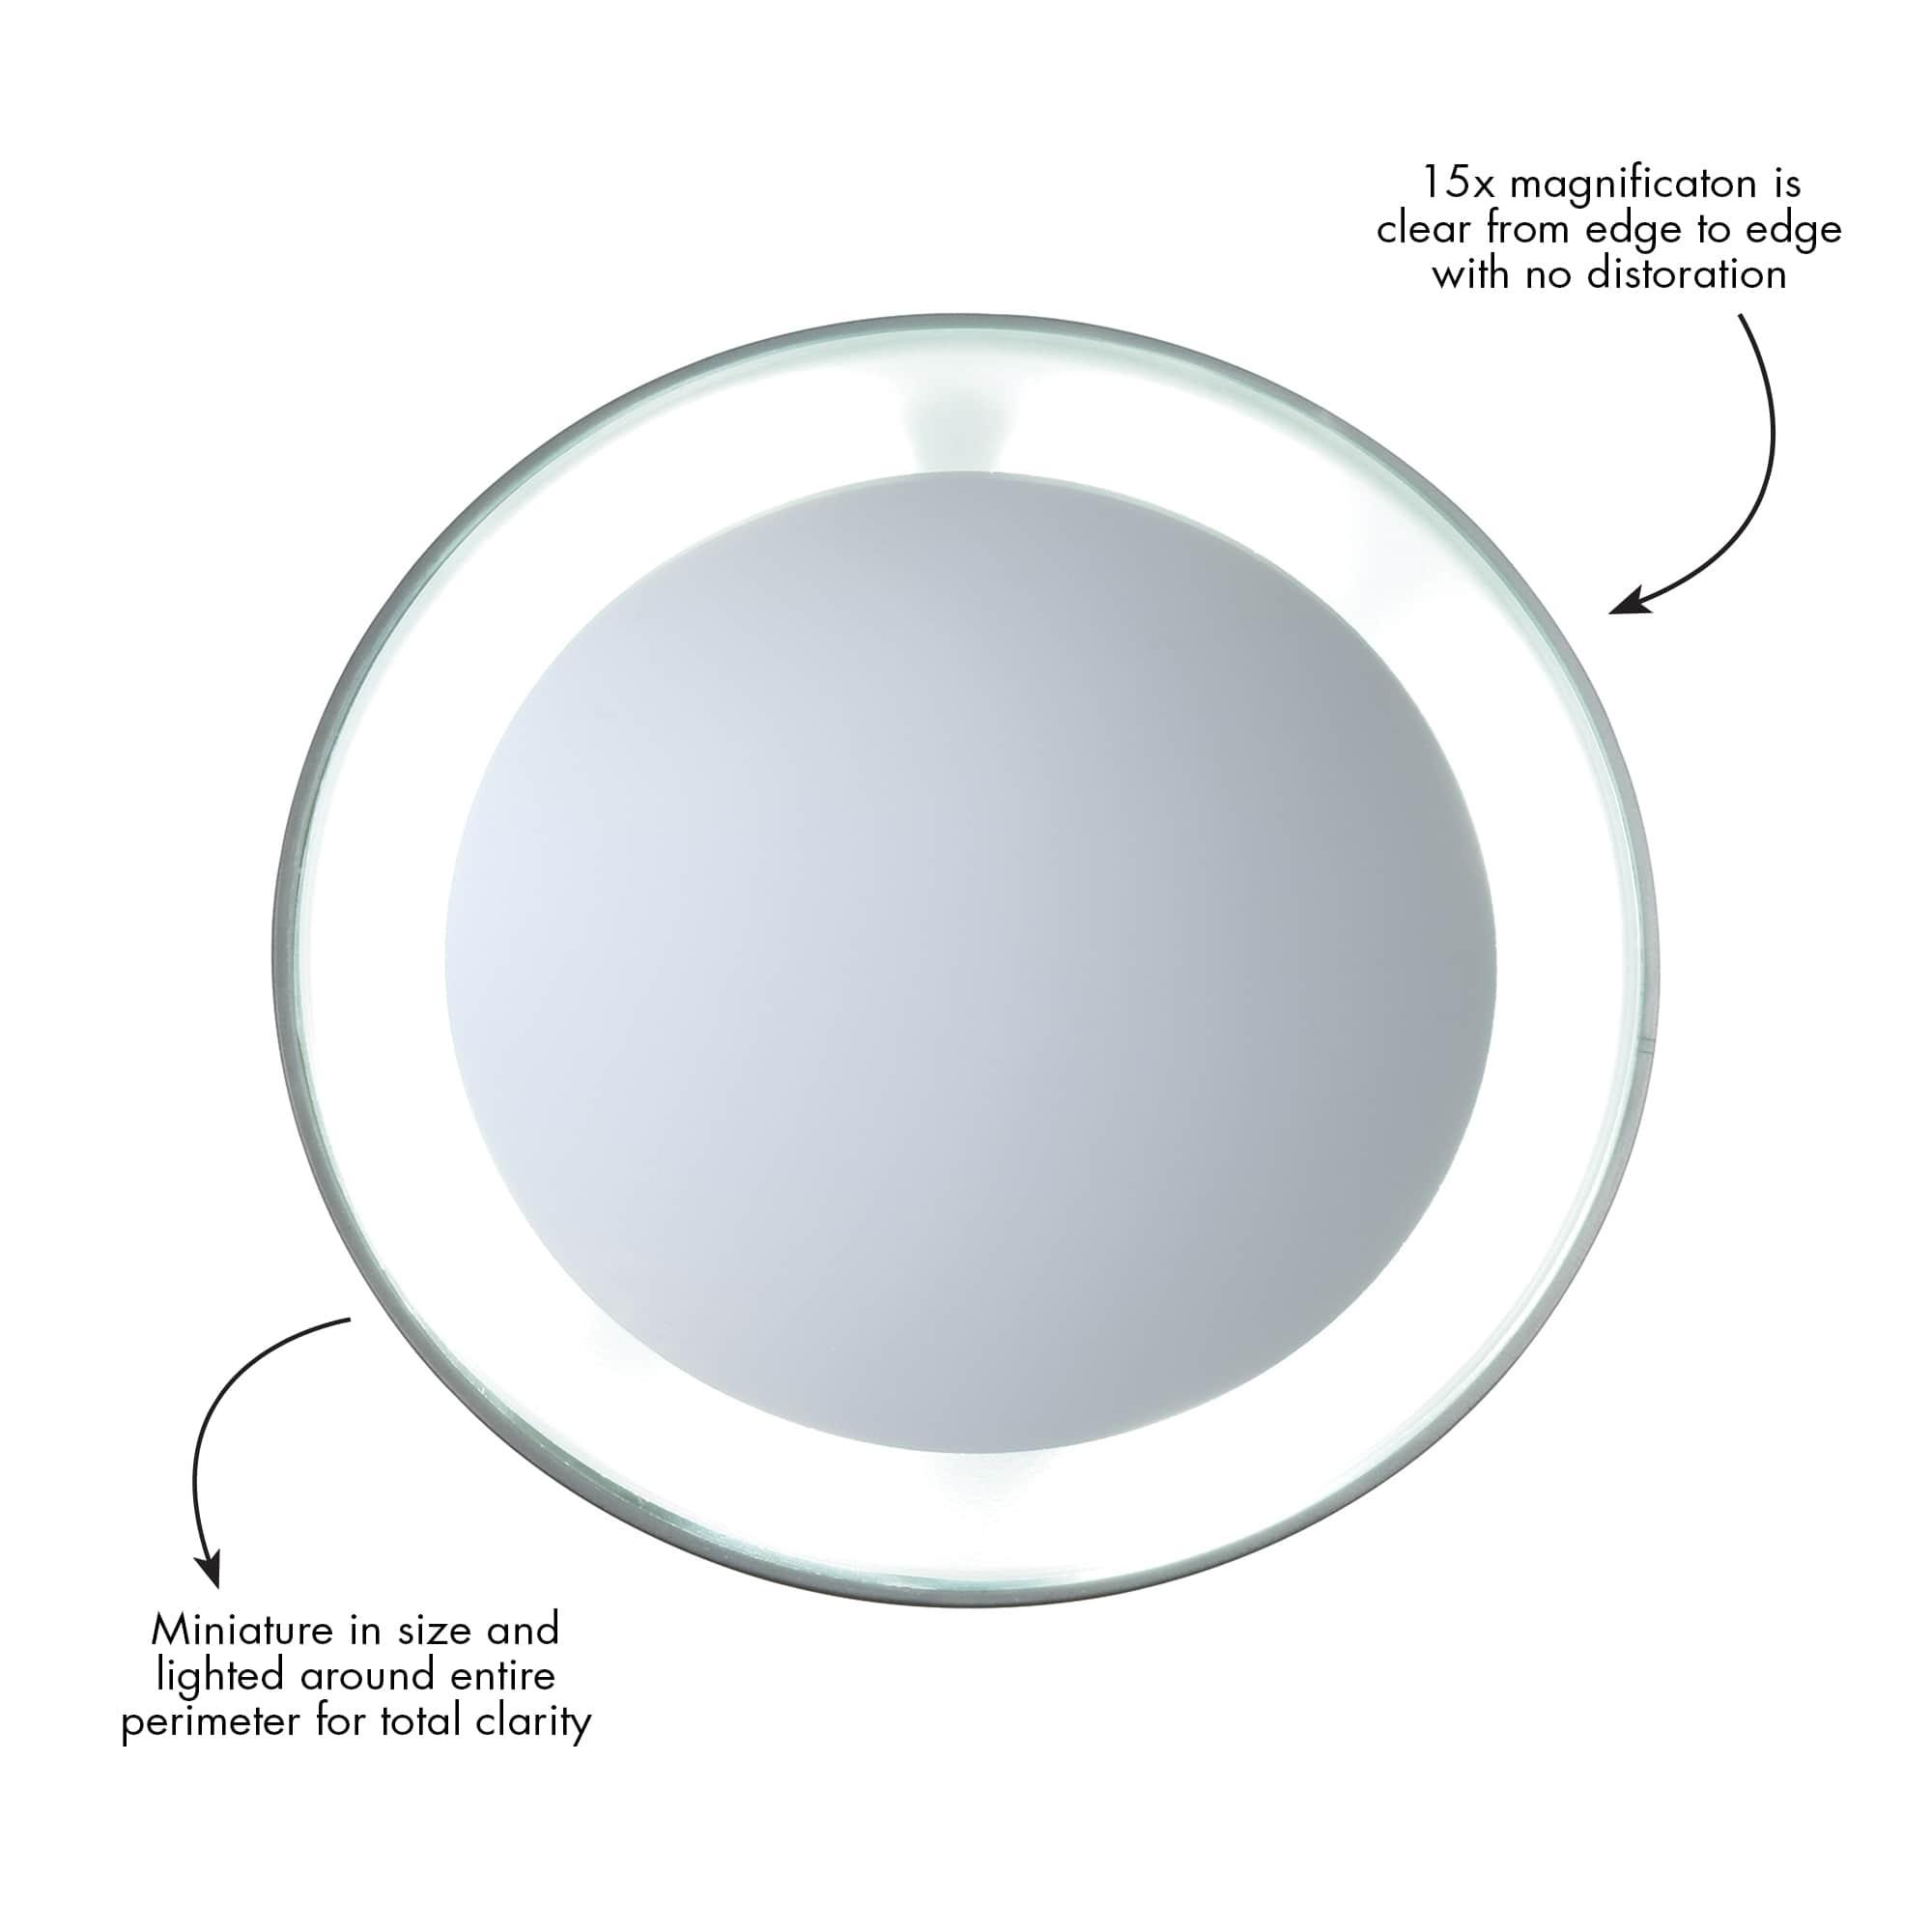 LED 15x Mini Mirror 6796-R | Tweezerman UK